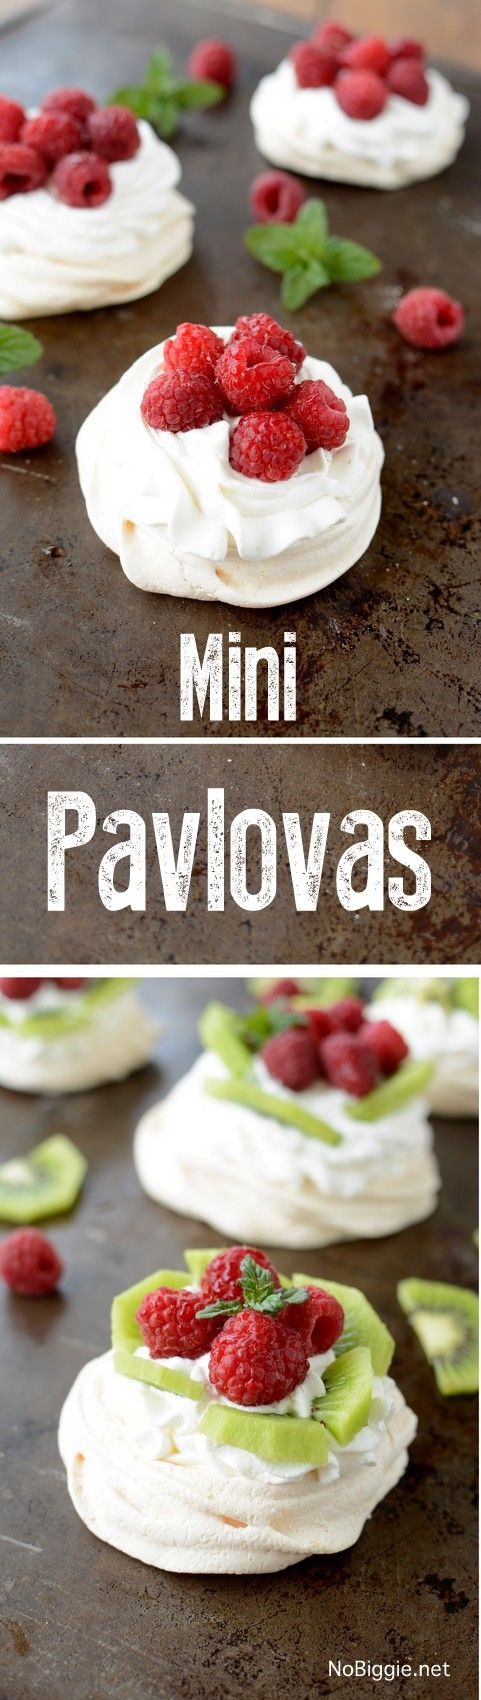 Mini Pavlovas with fresh fruit and fresh berries - so good! | recipe on NoBiggie.net